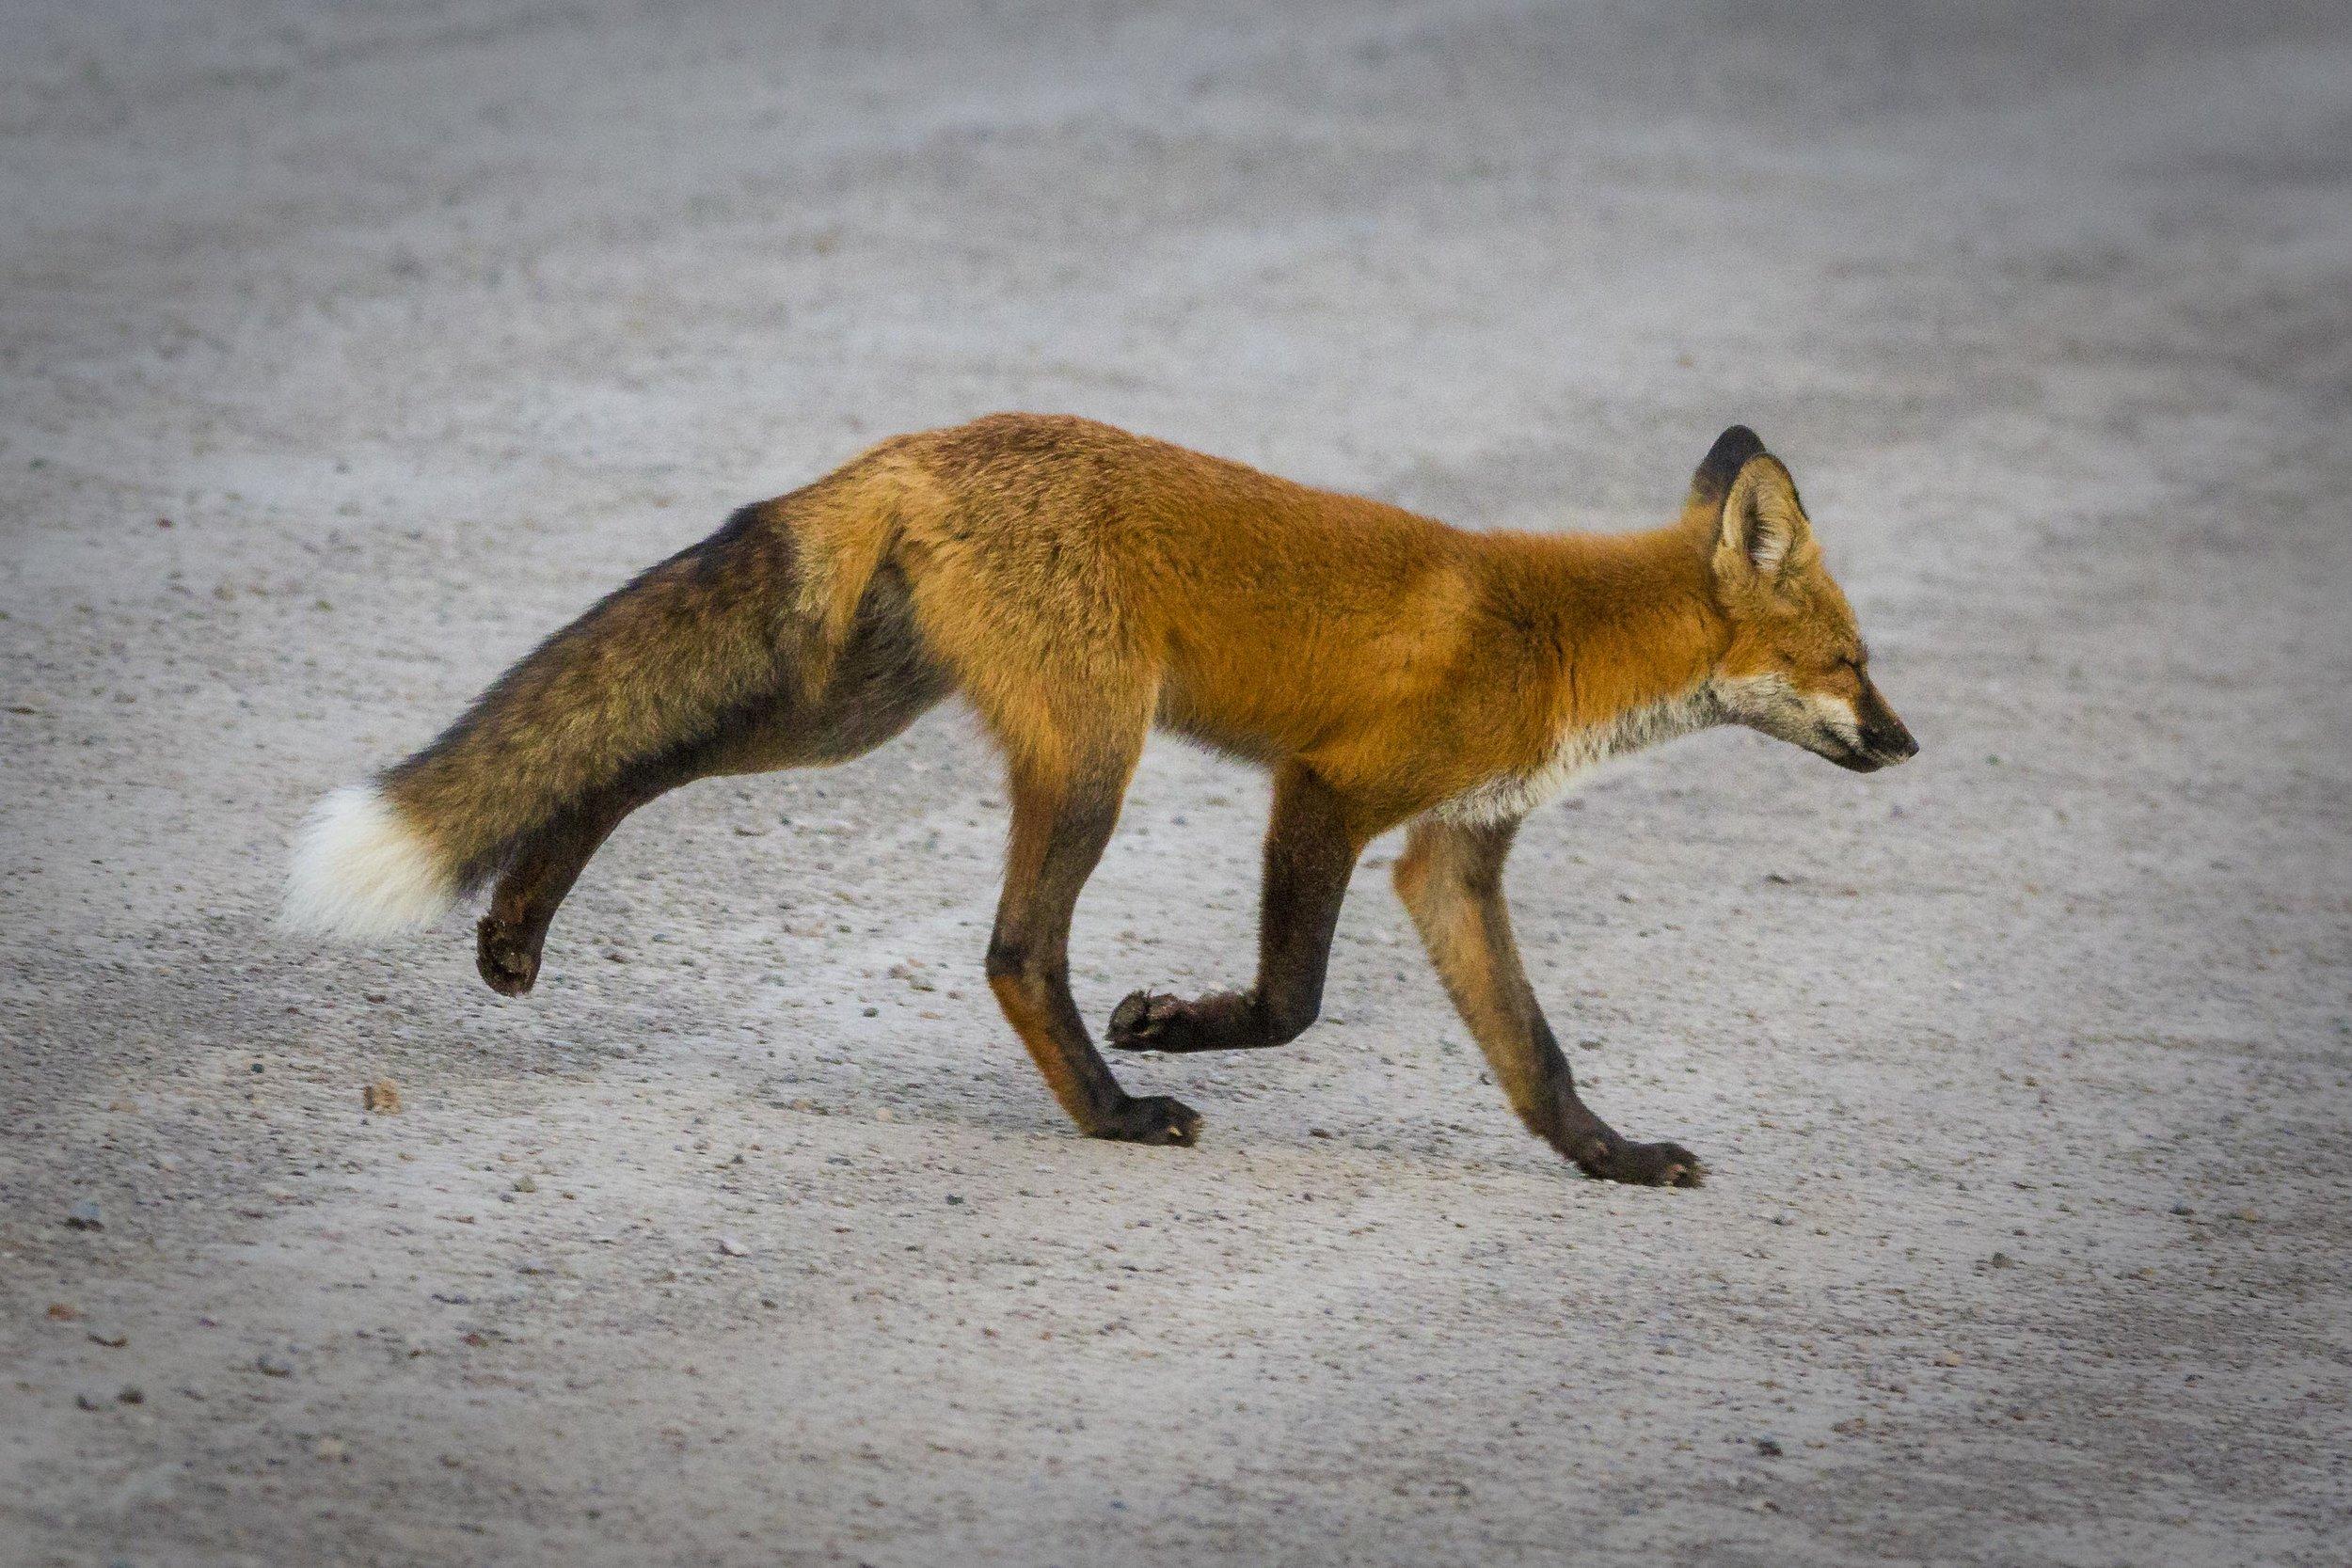 Dempster Highway, Roadtrip, Landscape, Arctic, rob gubiani, Tundra, Tombstone, Tuktoyuktuk, Inuvik, Dempster, Yukon, travel, wanderlust, fox, red fox, arctic fox,